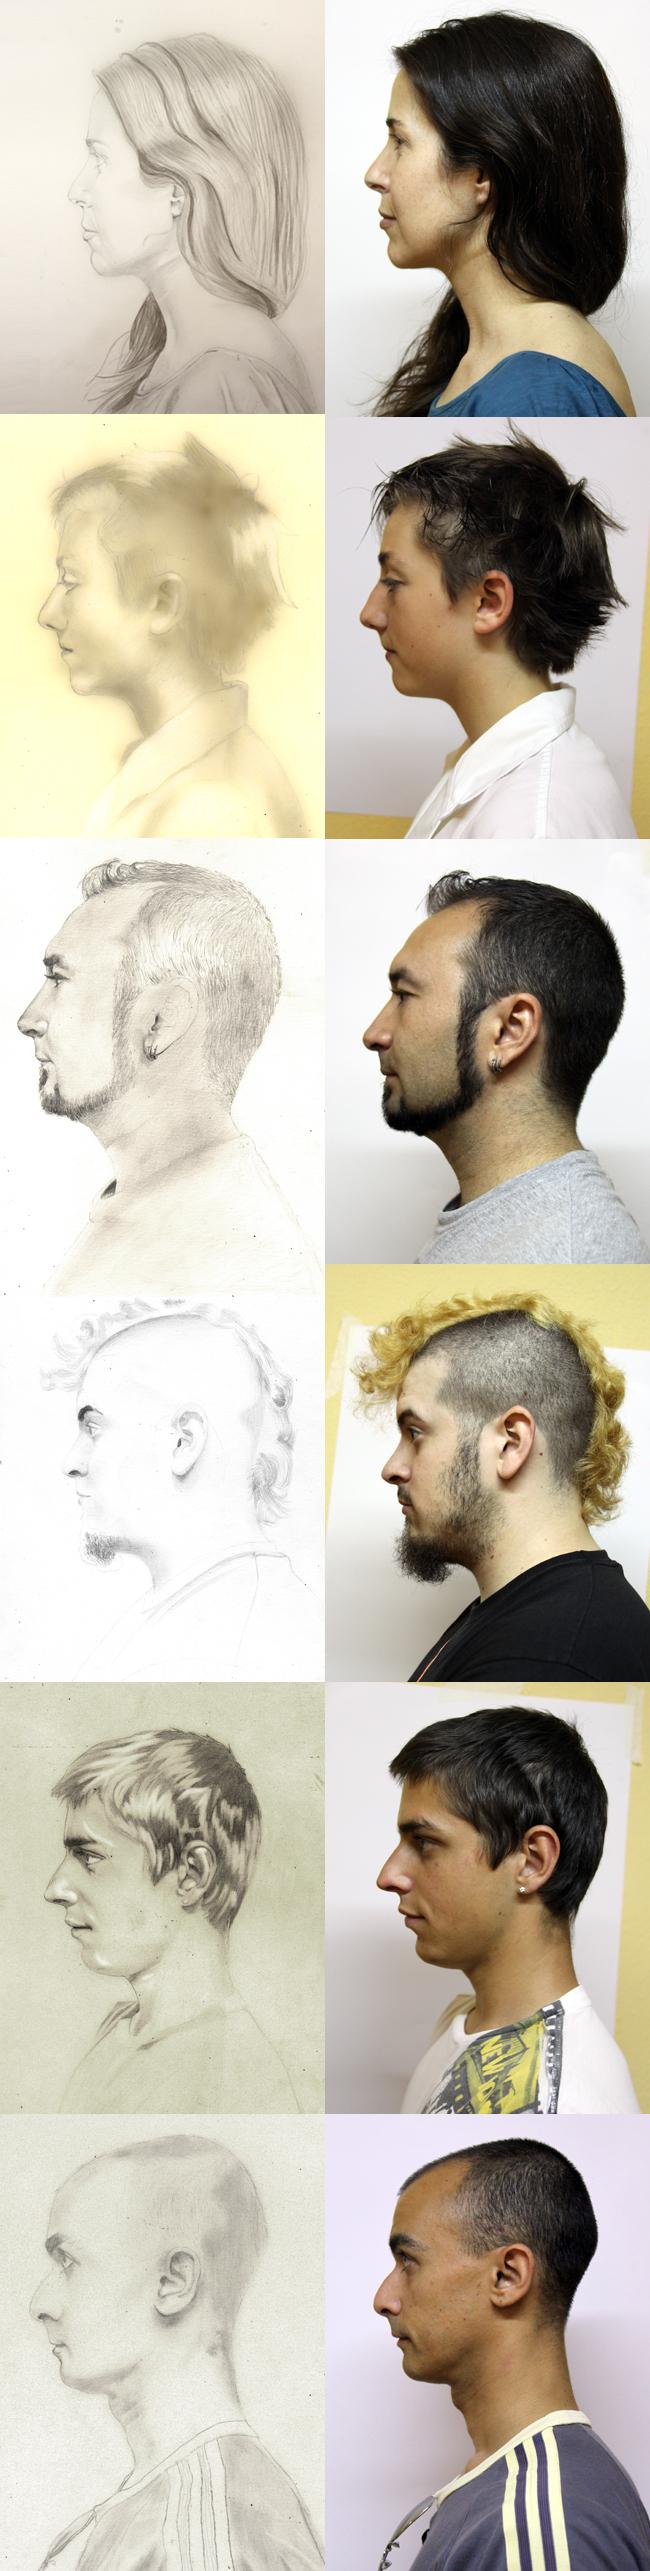 auto-retratos-dibujo-alumnos-cursos-academia-c10-lapiz-bocetos